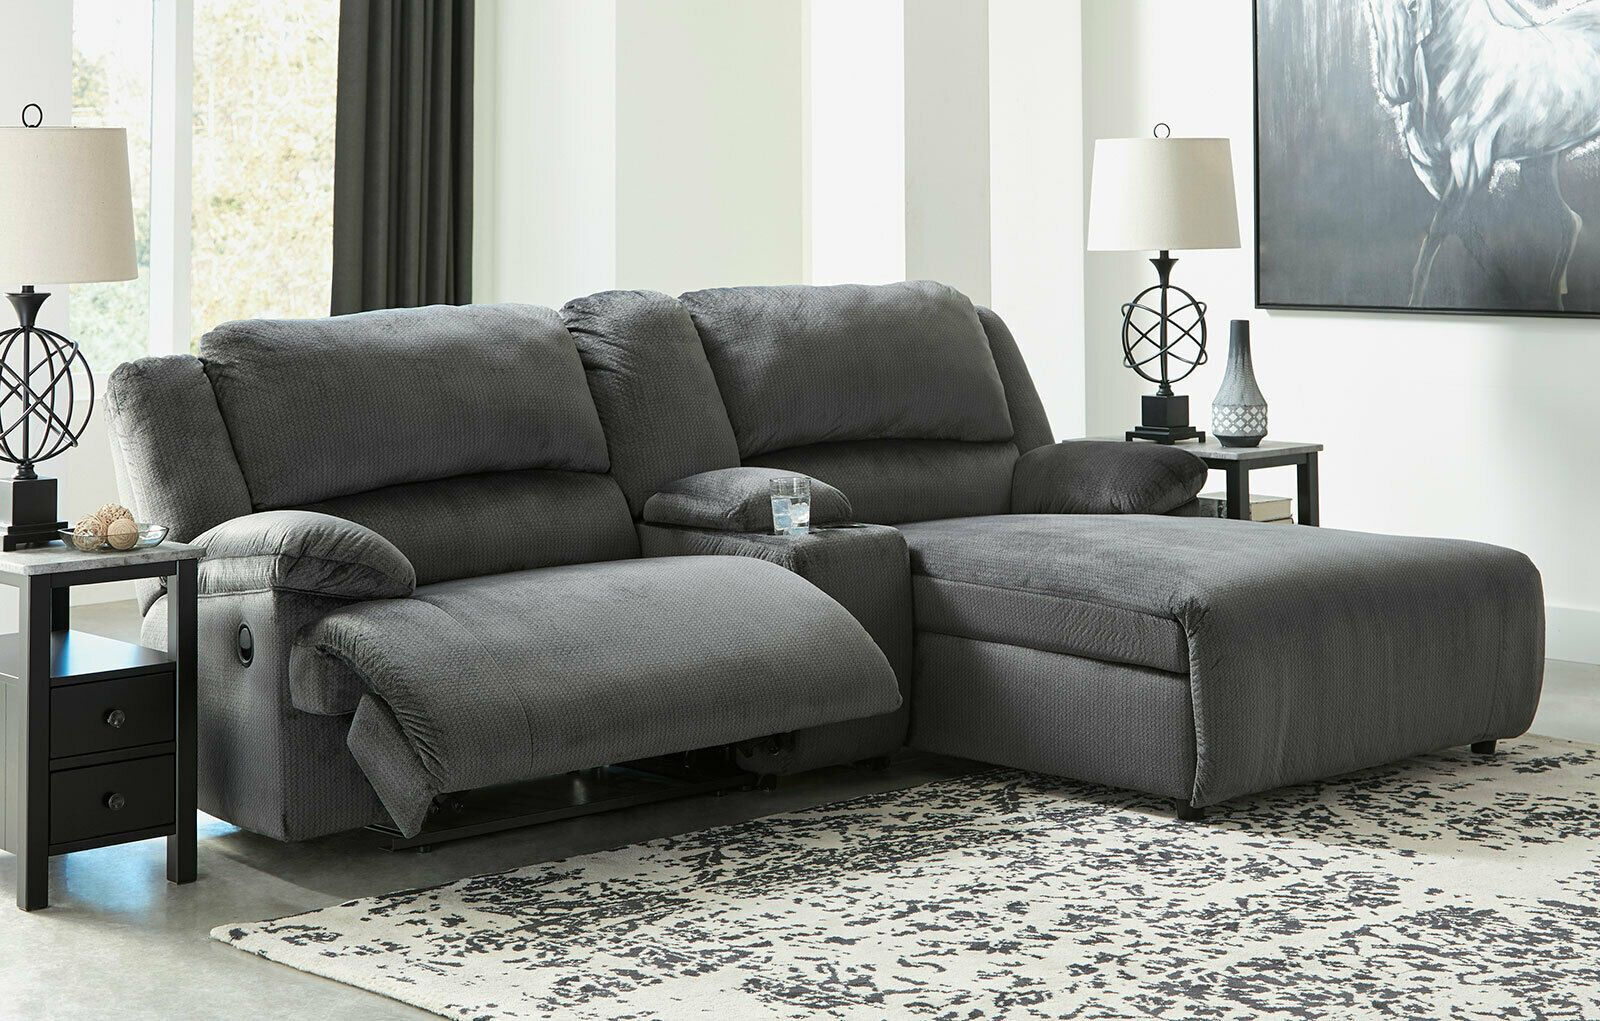 Surprising Naples Living Room Sectional Gray Microfiber Reclining Sofa Andrewgaddart Wooden Chair Designs For Living Room Andrewgaddartcom